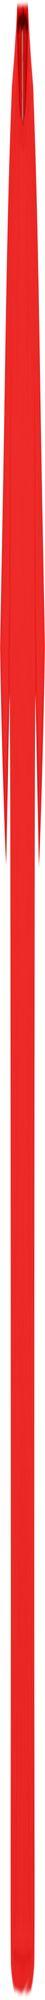 Футболка унисекс SPORTY 140, красная